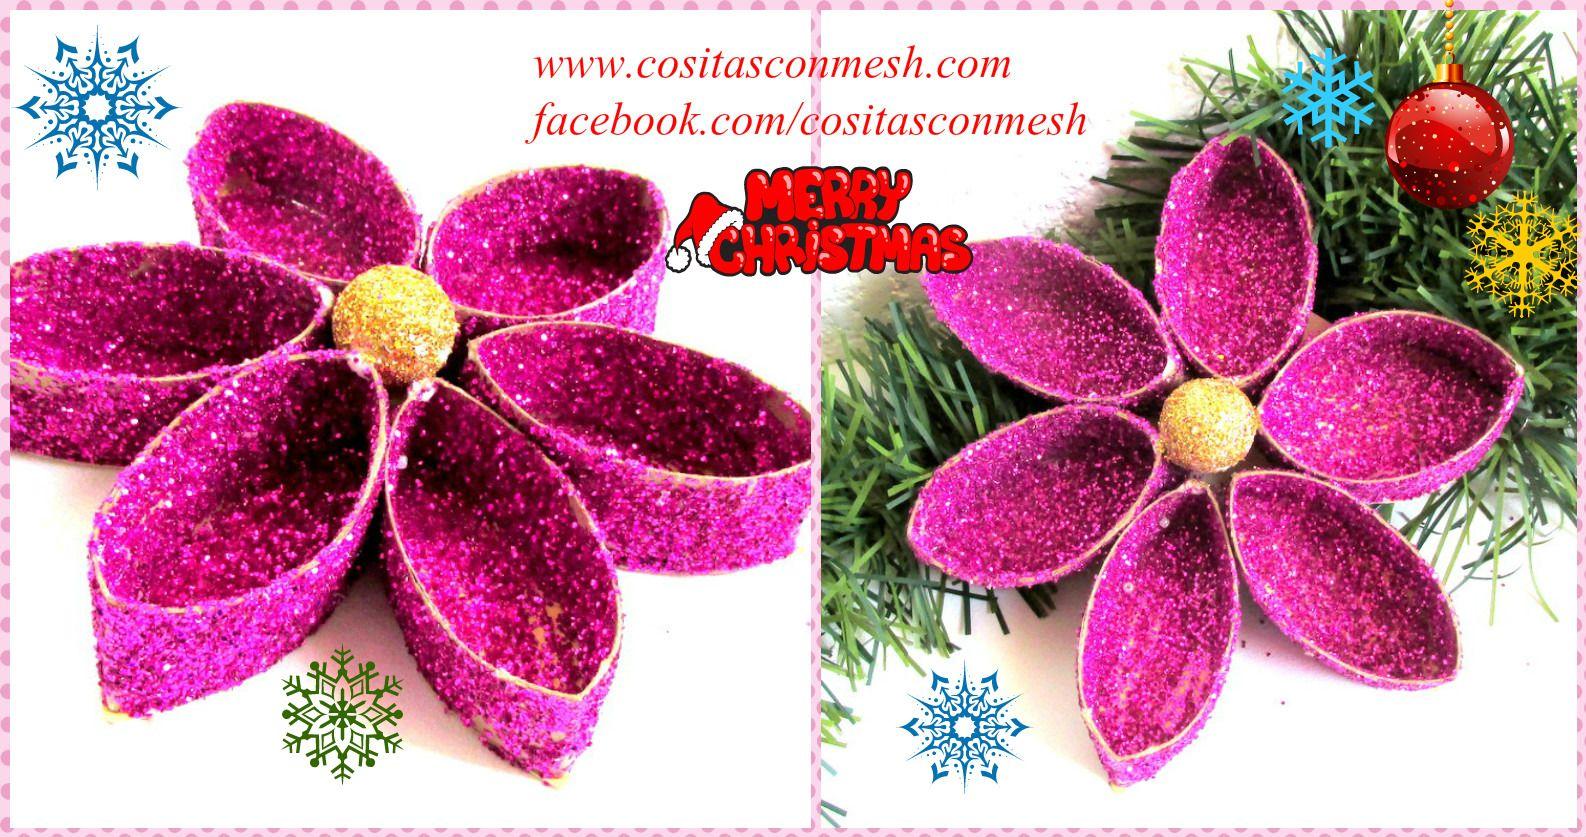 Flores navideñas reciclando tubos de papel higiénico ~ cositasconmesh